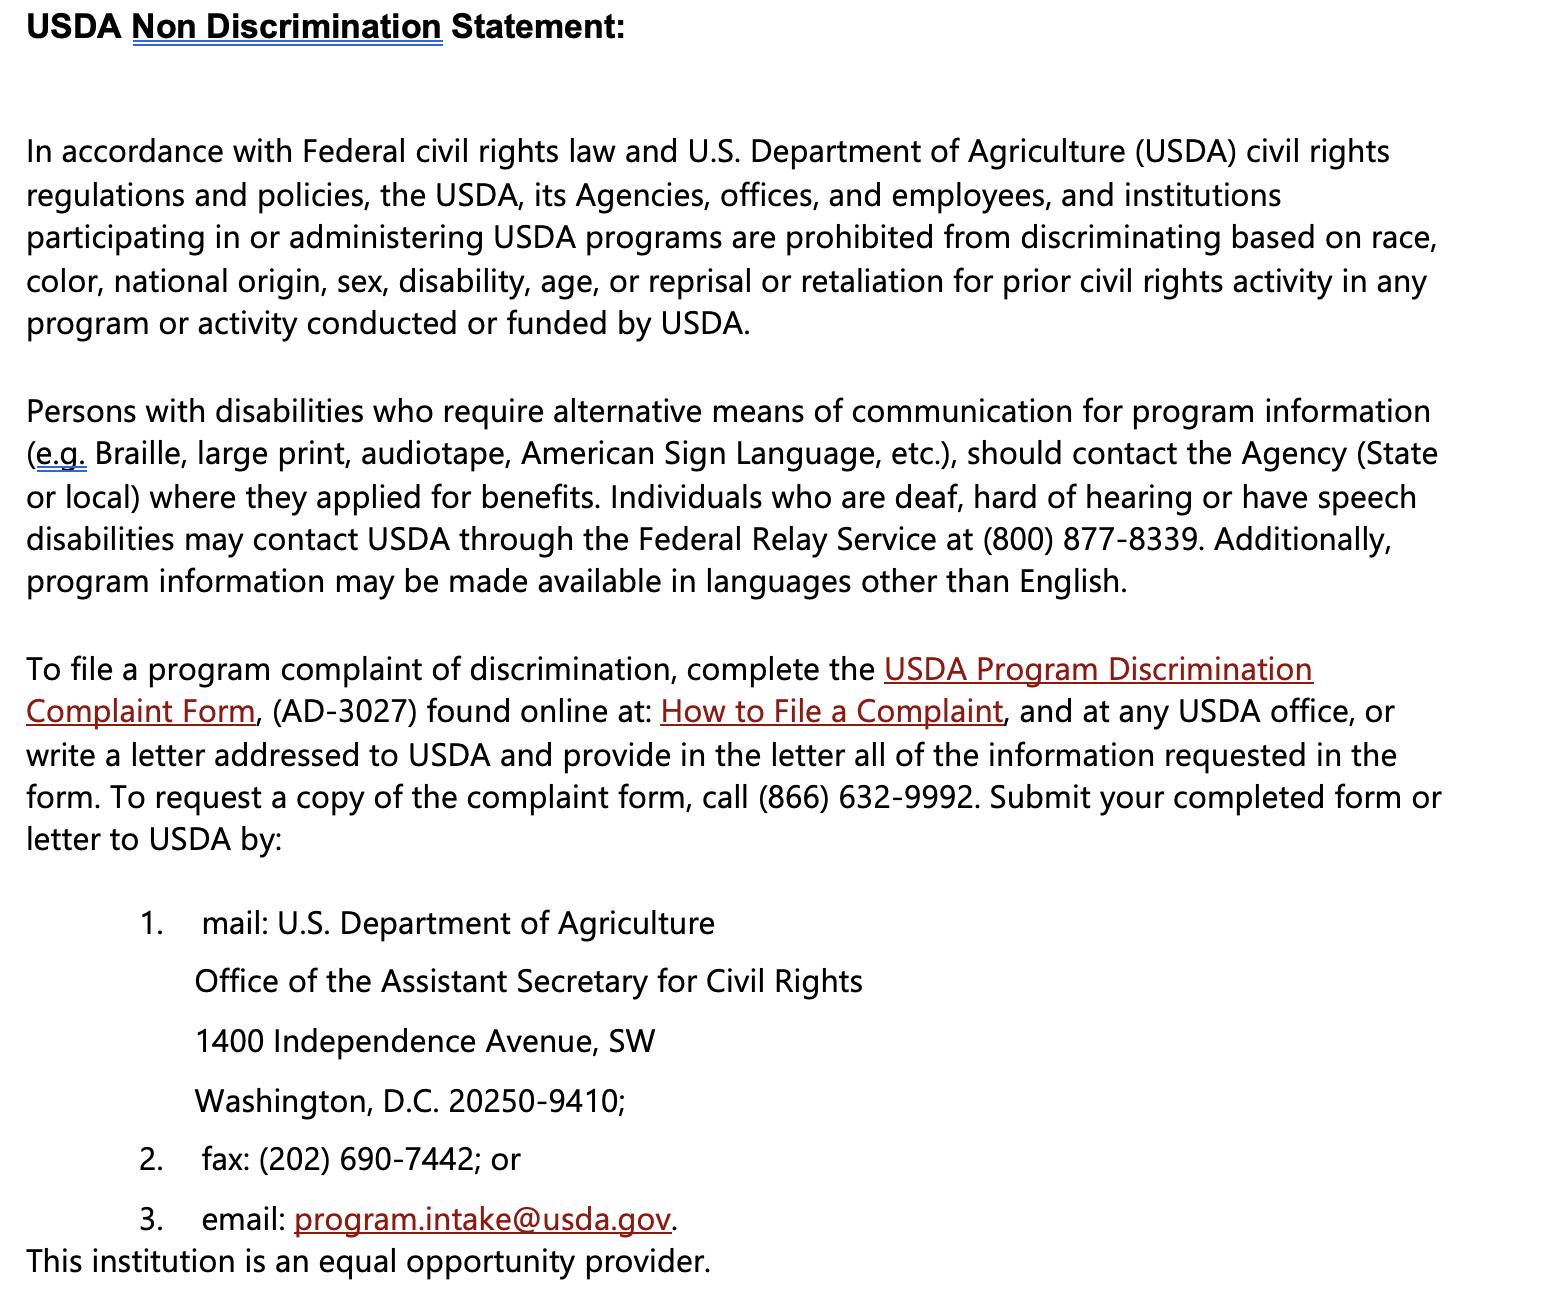 USDA Non Discrimination Statement